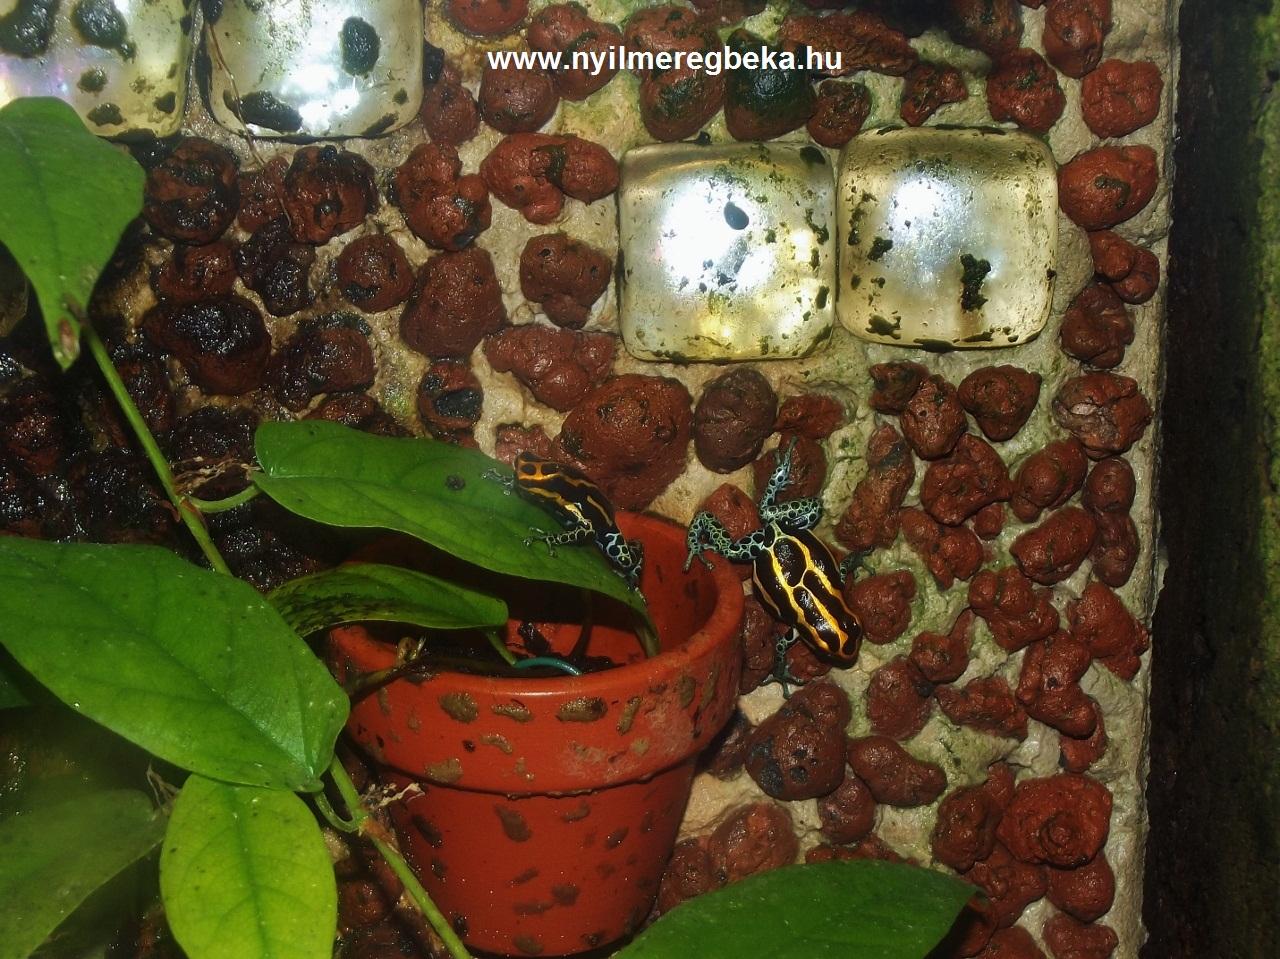 amazonicaiquitos